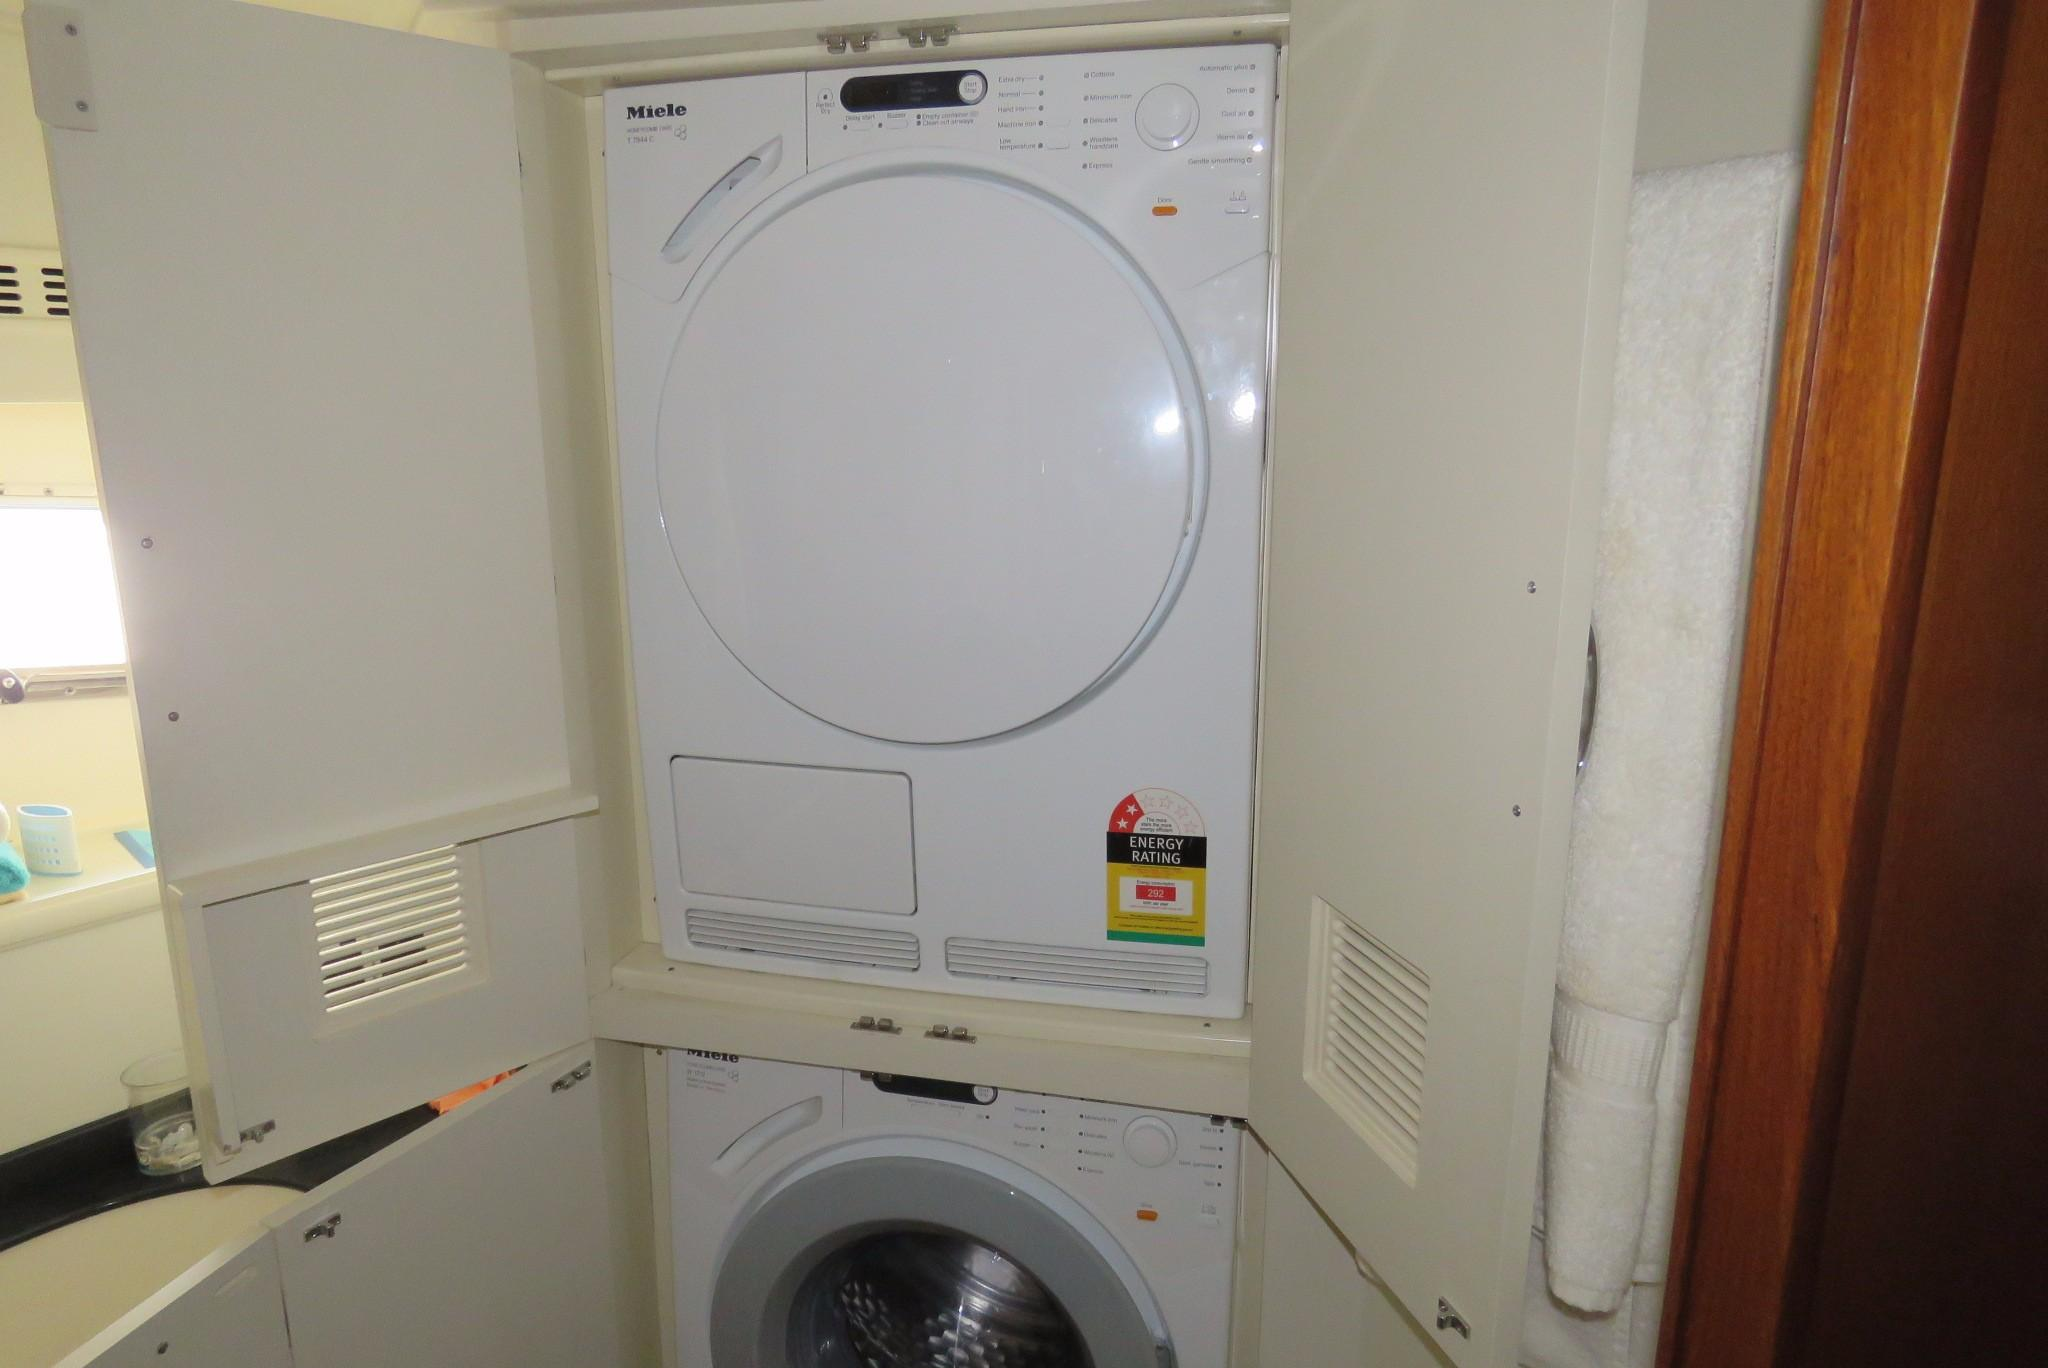 59 Grand Banks Washer Dryer